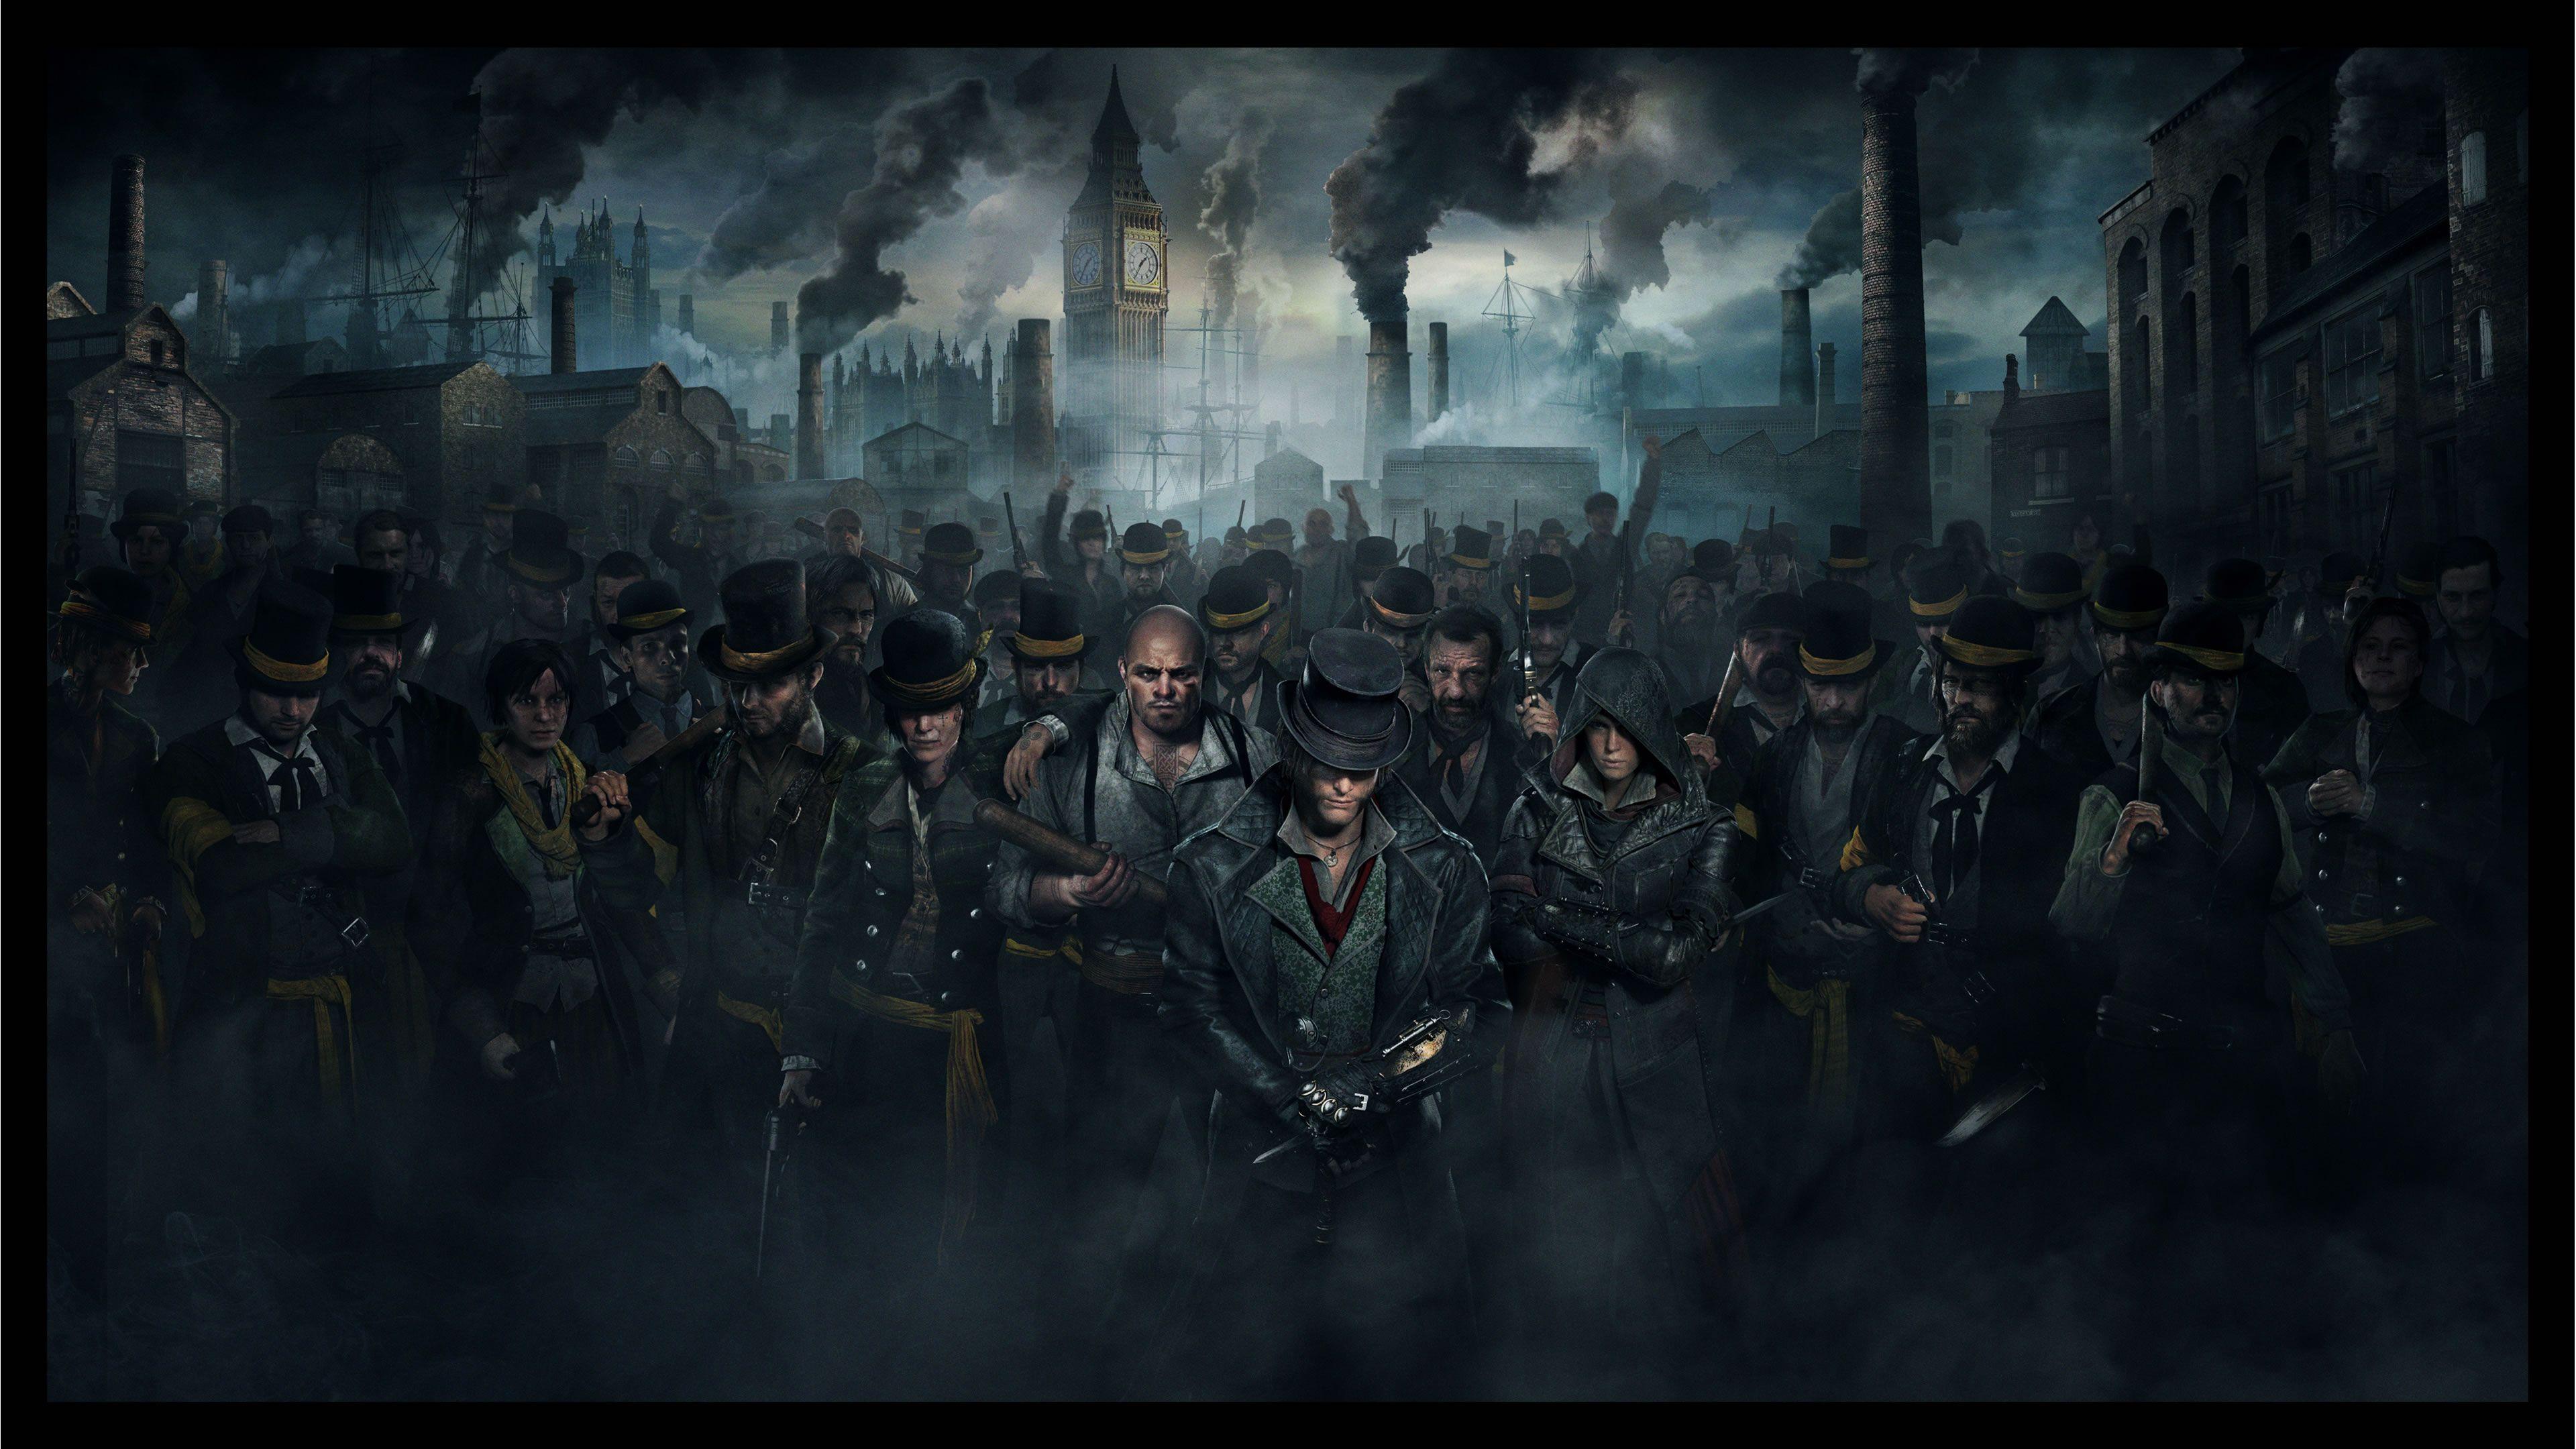 Evie Frye Assassins Creed Syndicate Hd Desktop Wallpaper 風景